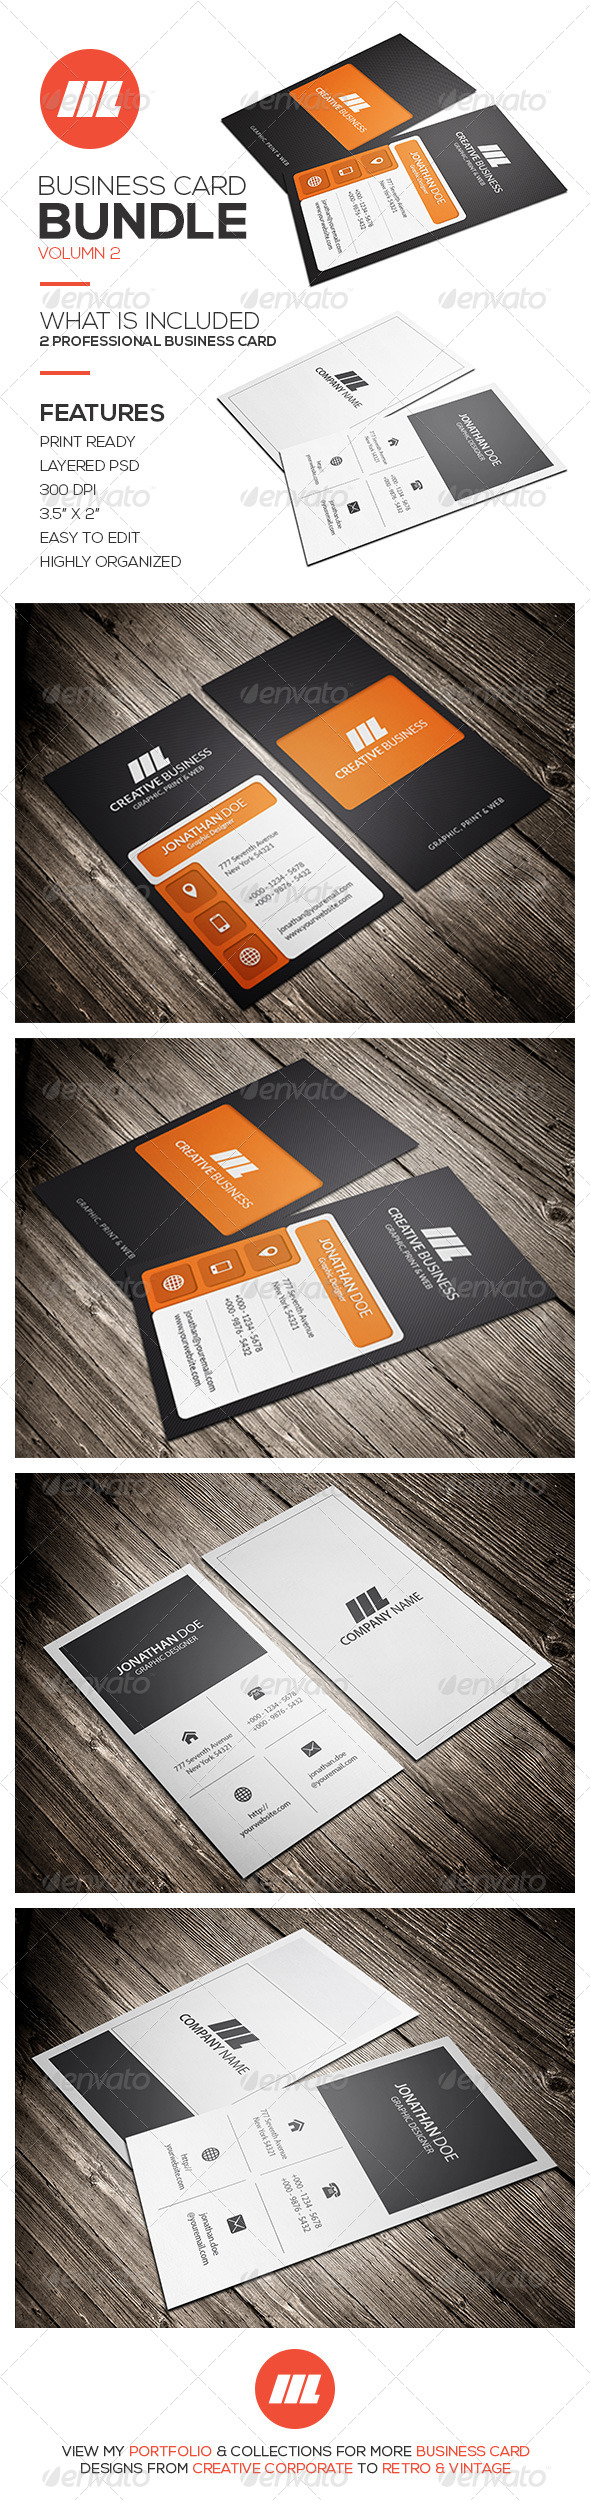 GraphicRiver Business Card Bundle Vol 2 8606040